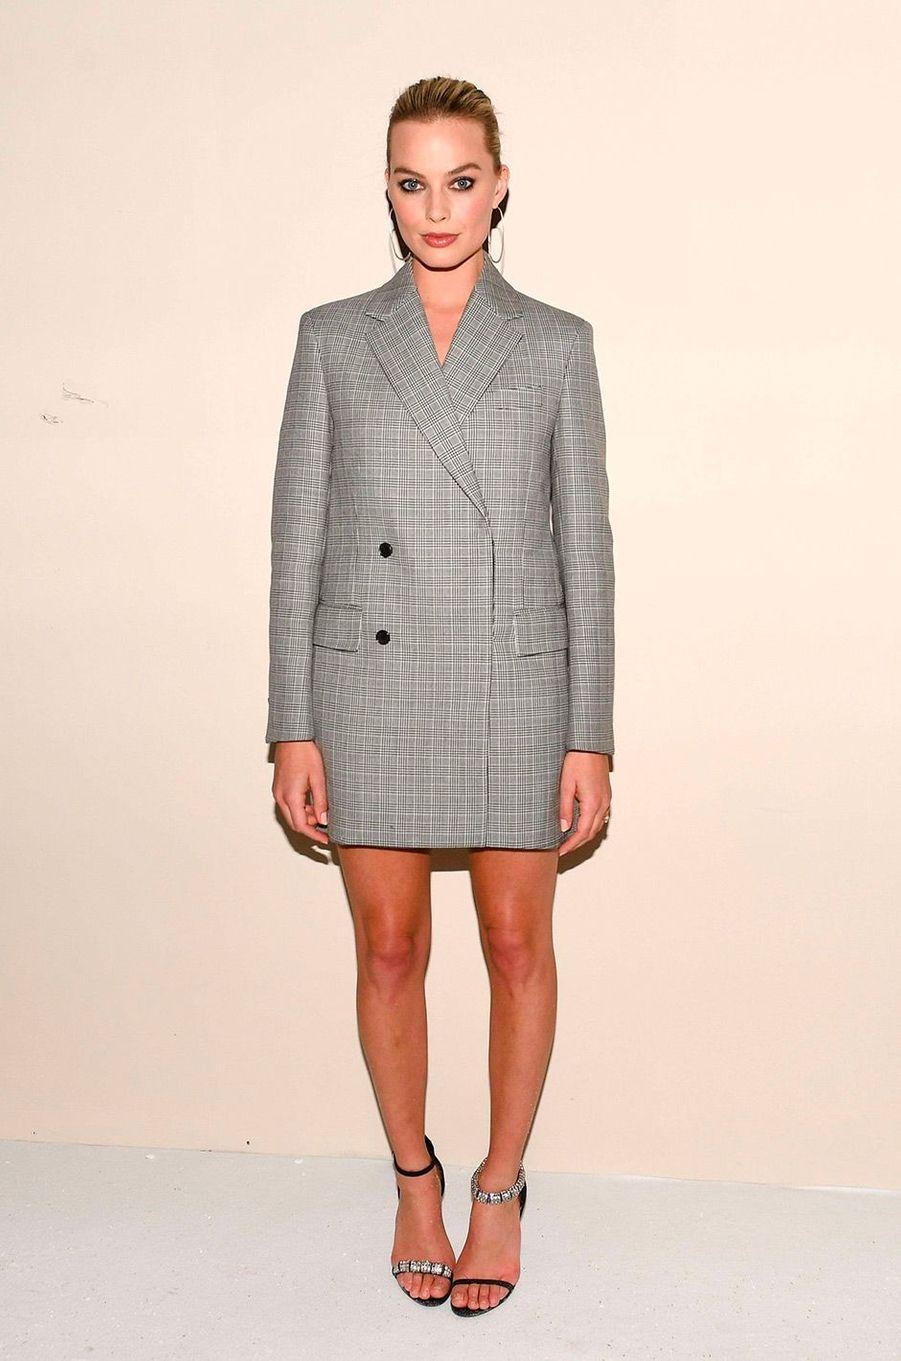 Margot Robbie au défilé Calvin Klein